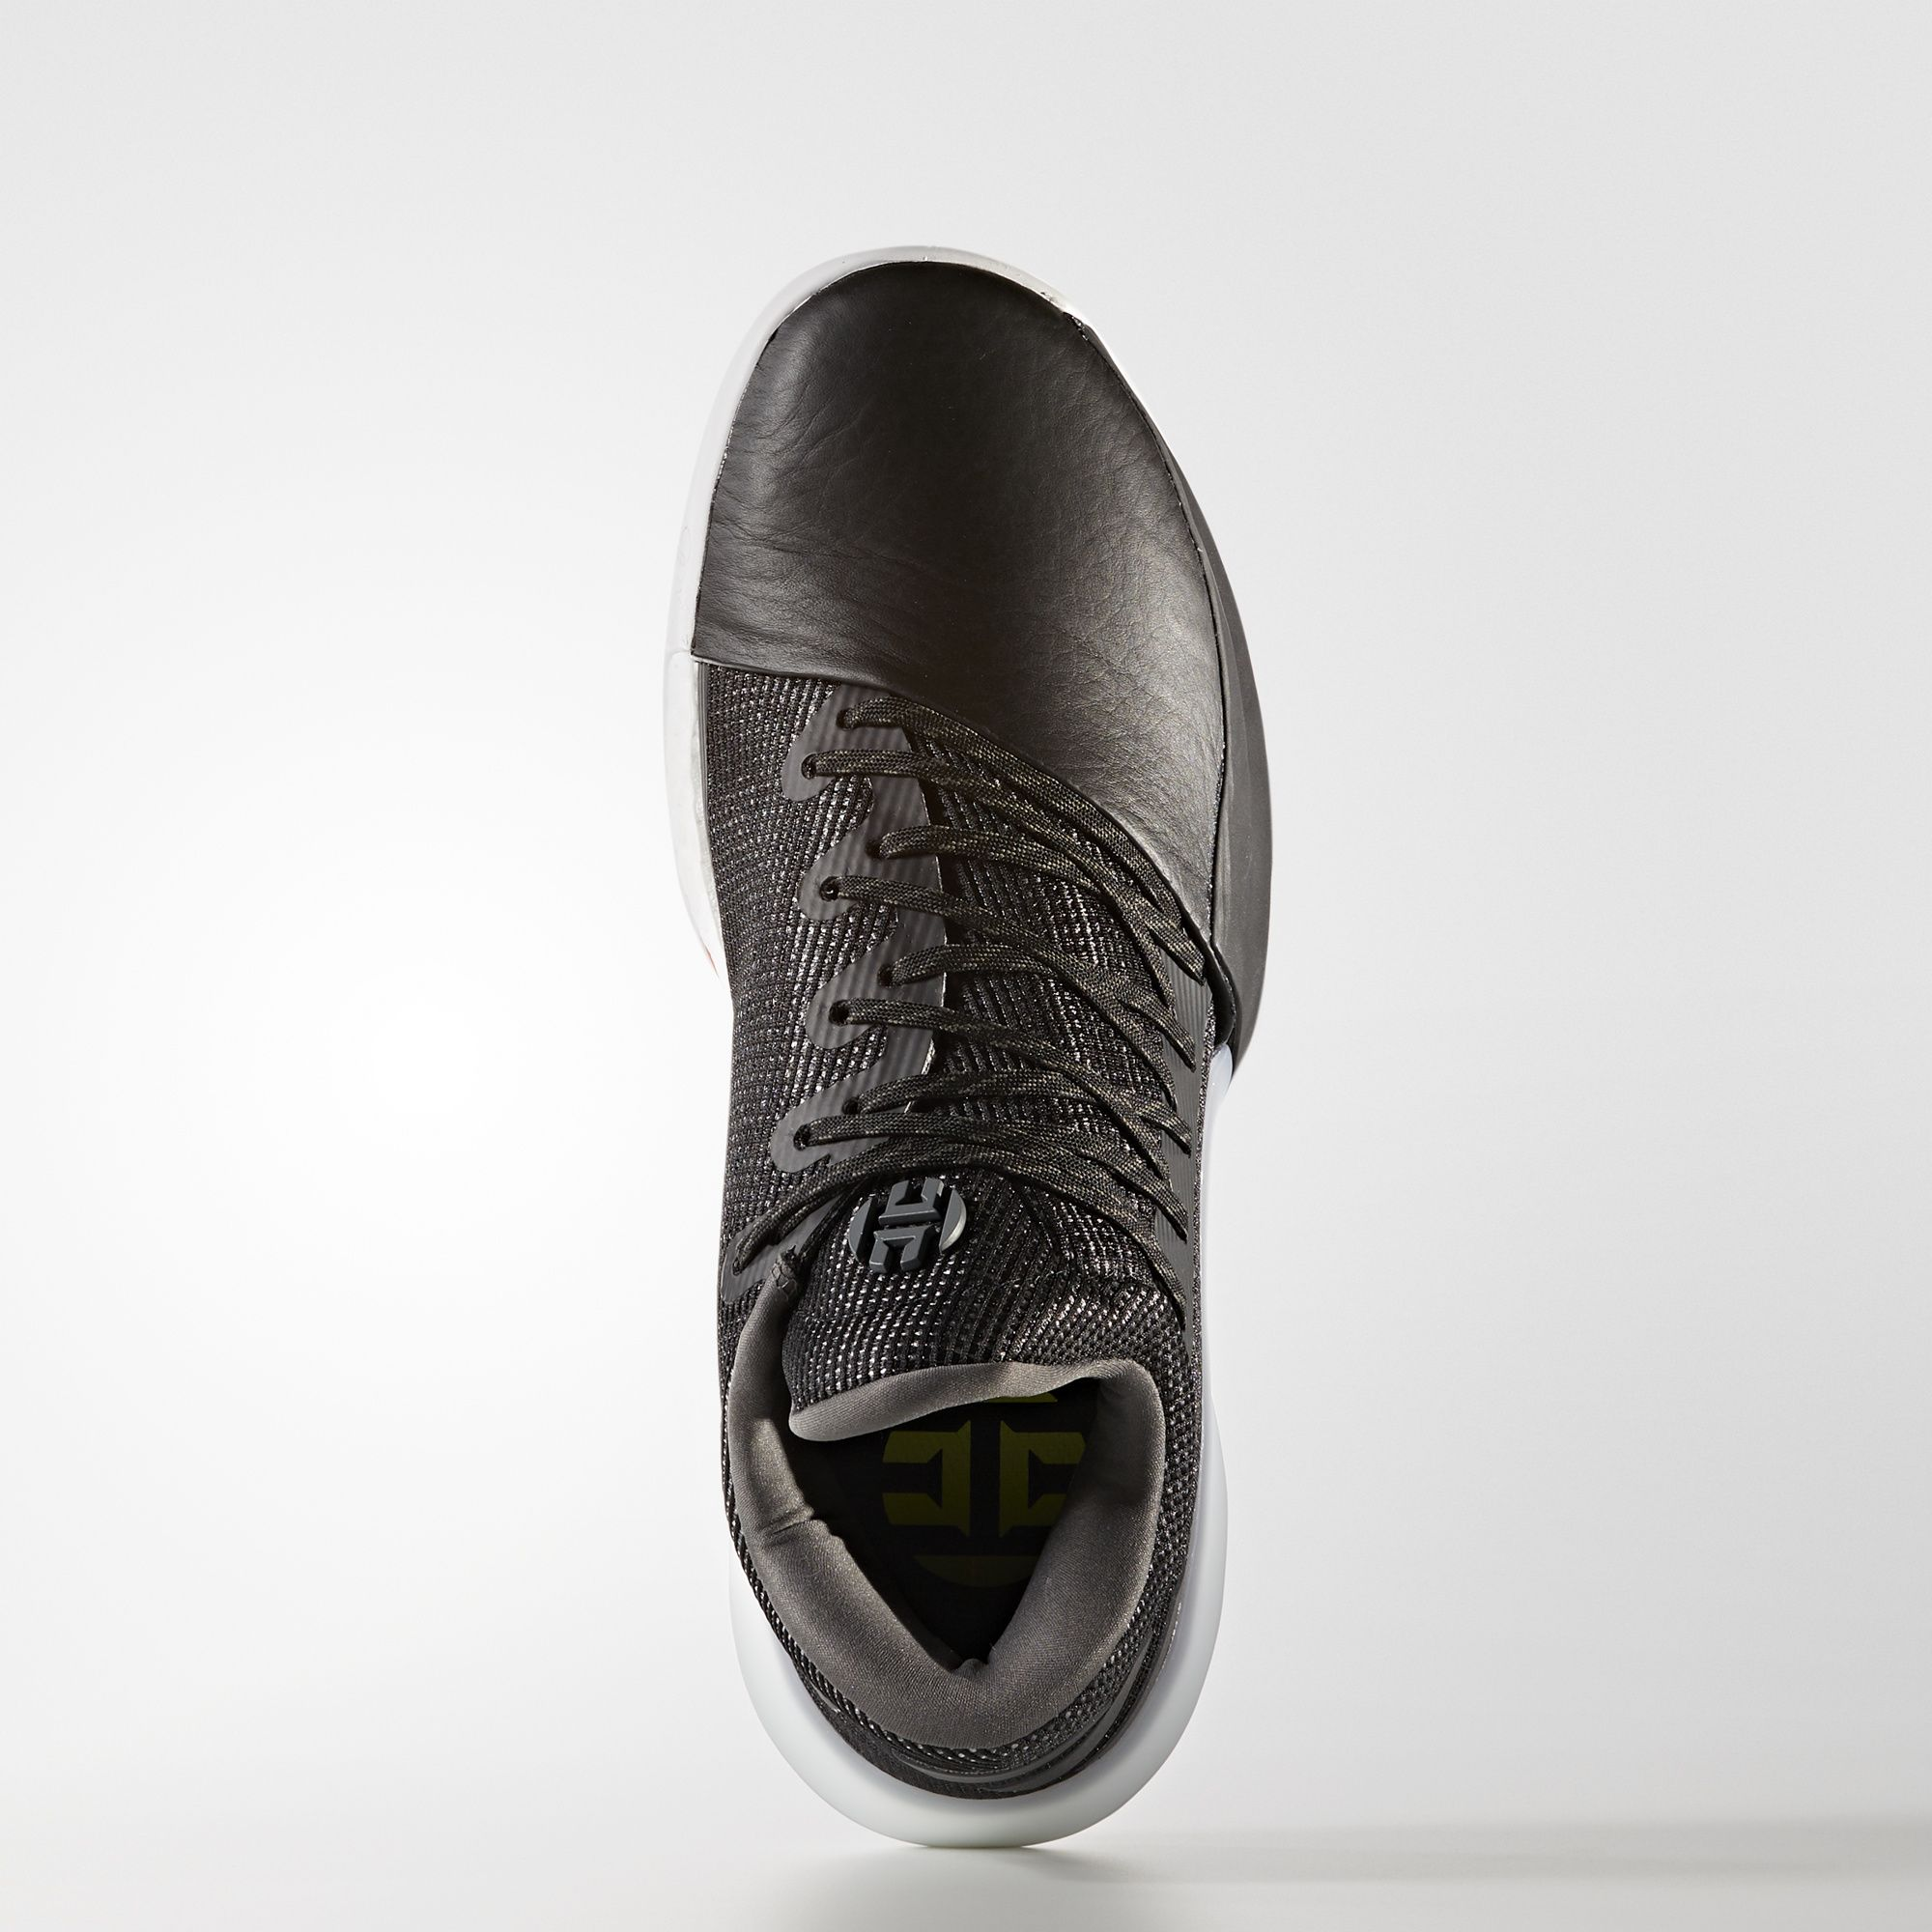 Adidas Endurecen Vol 1 Pk lINPteP1